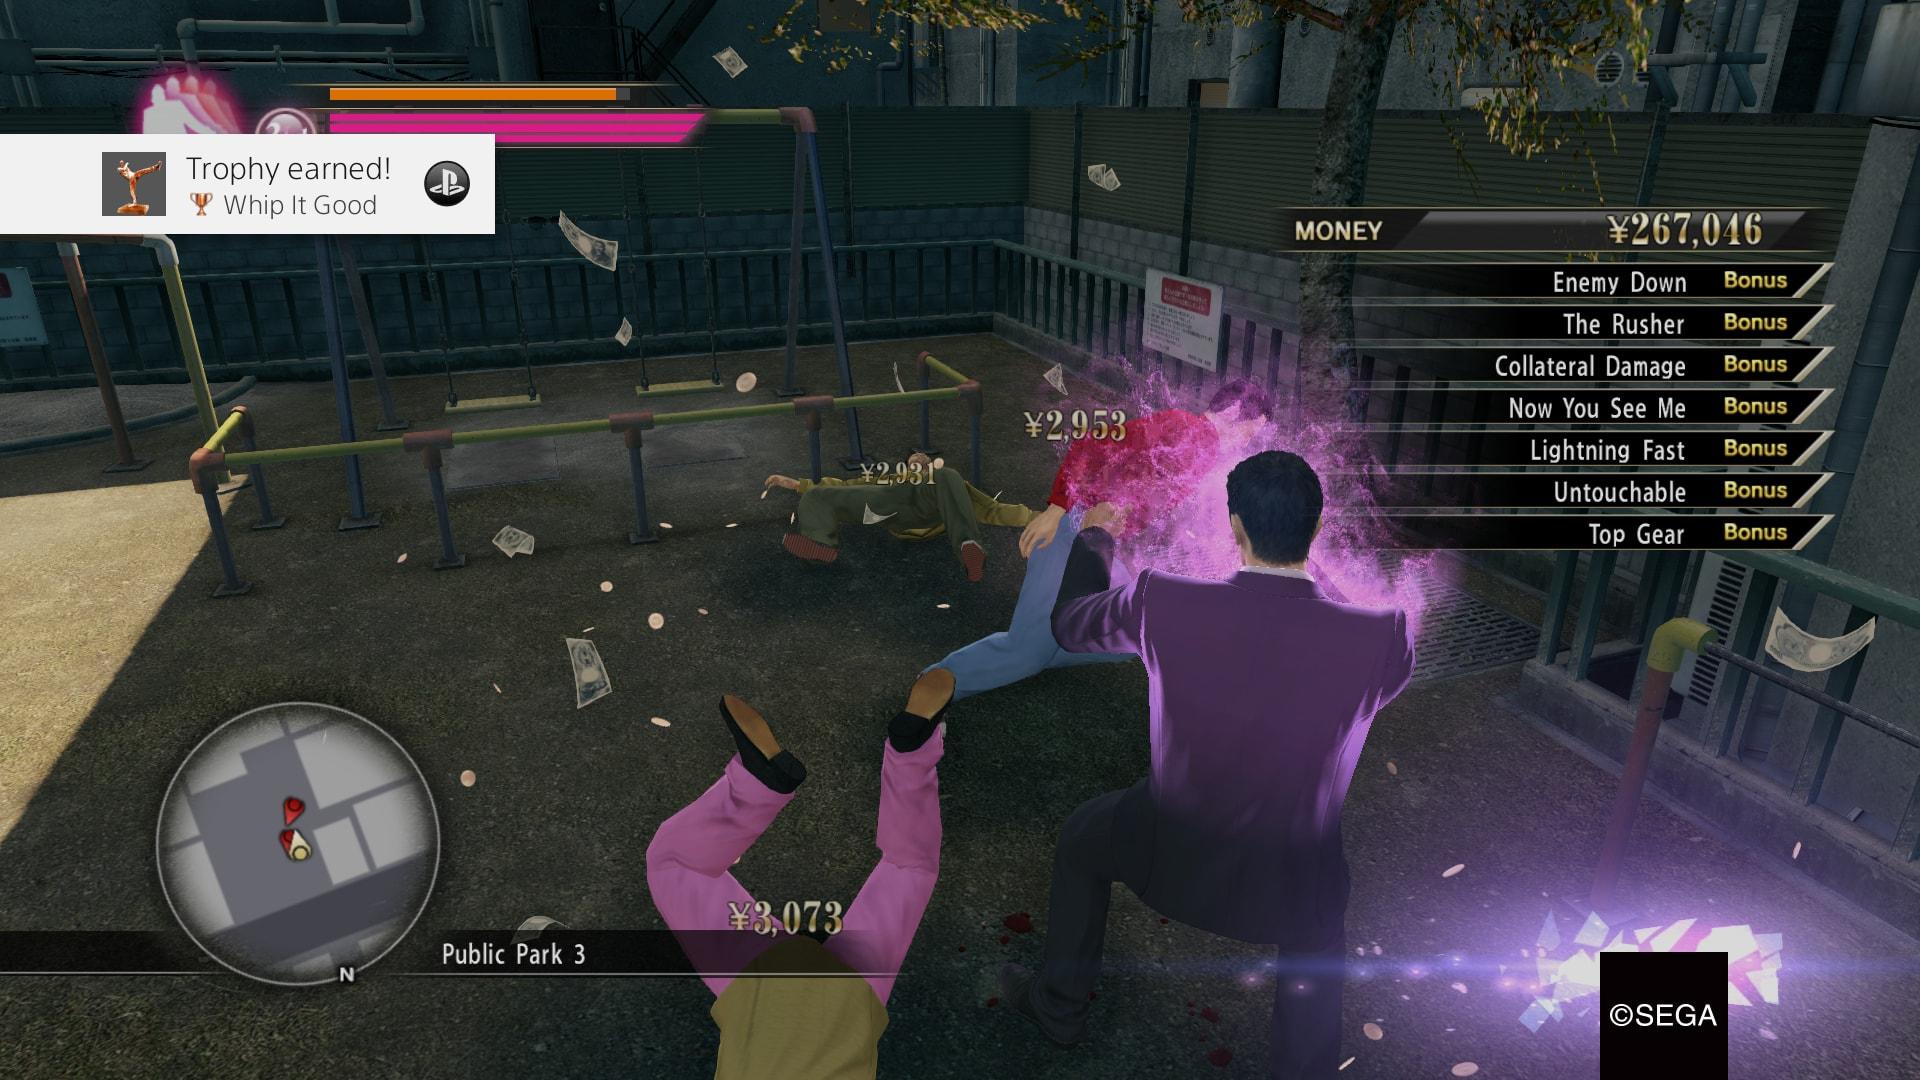 Yakuza 0 - prachy, neony, špína a hnus velkoměsta 138975